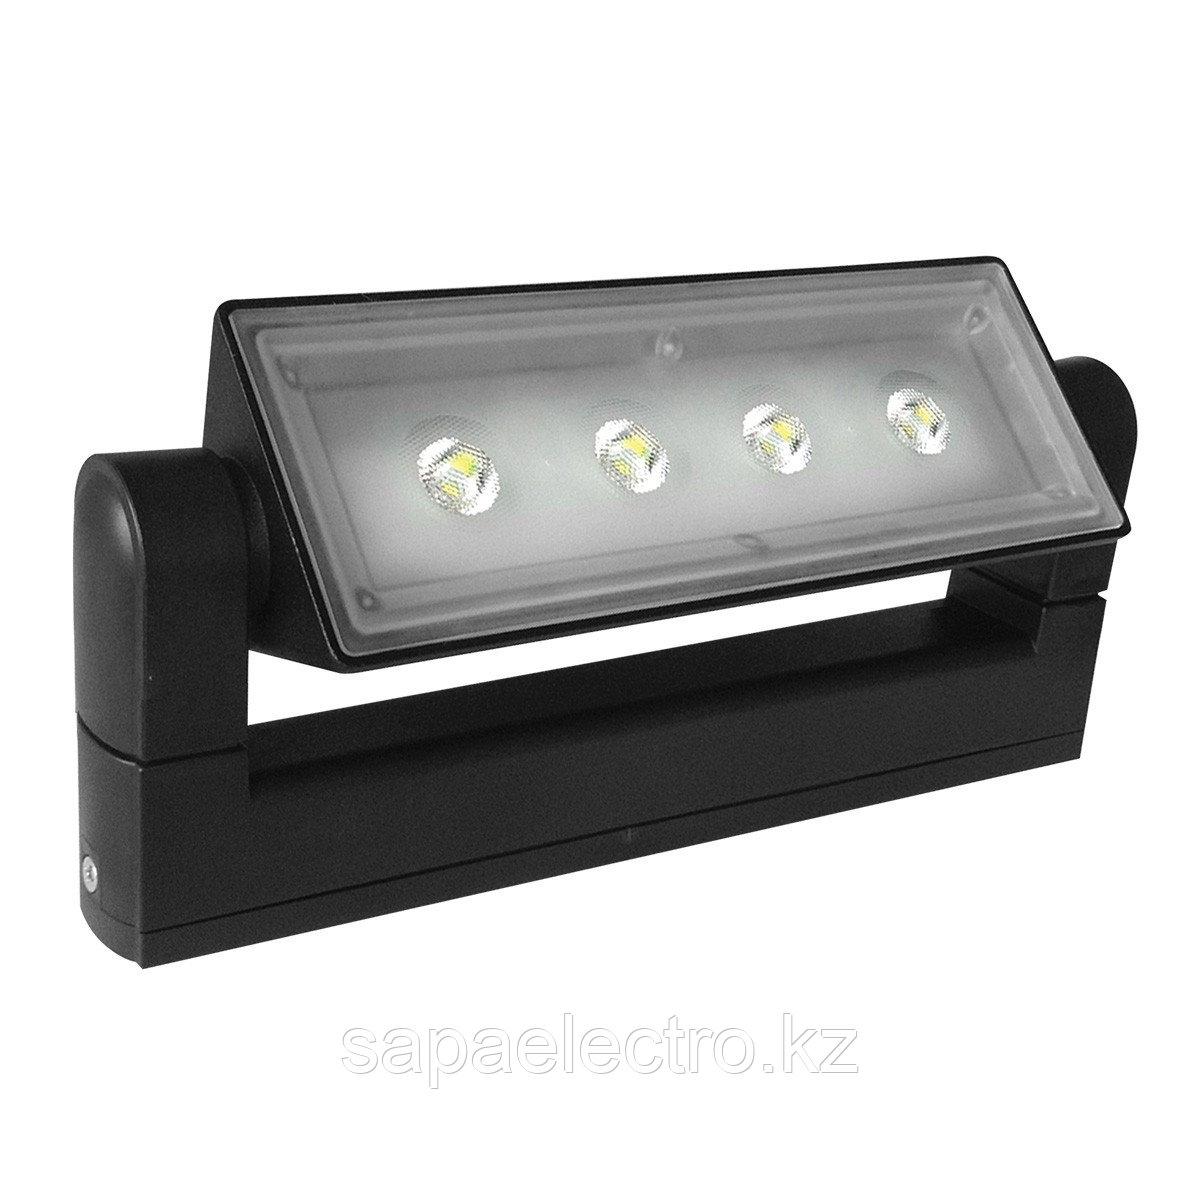 Свет-к LED 3229 12W BLACK 4000K IP54  (TEKSAN) 12шт